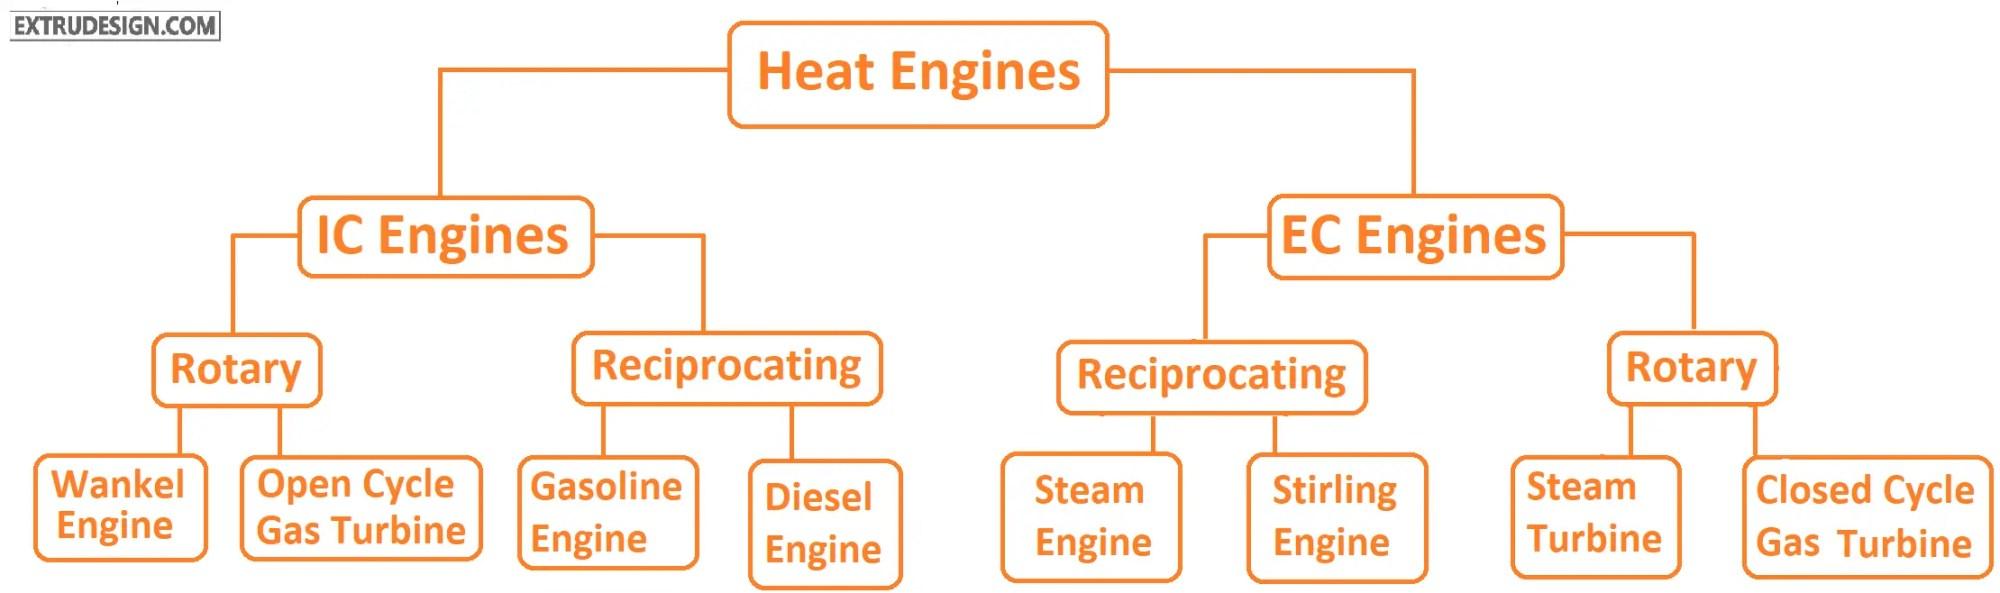 hight resolution of heat engines classification